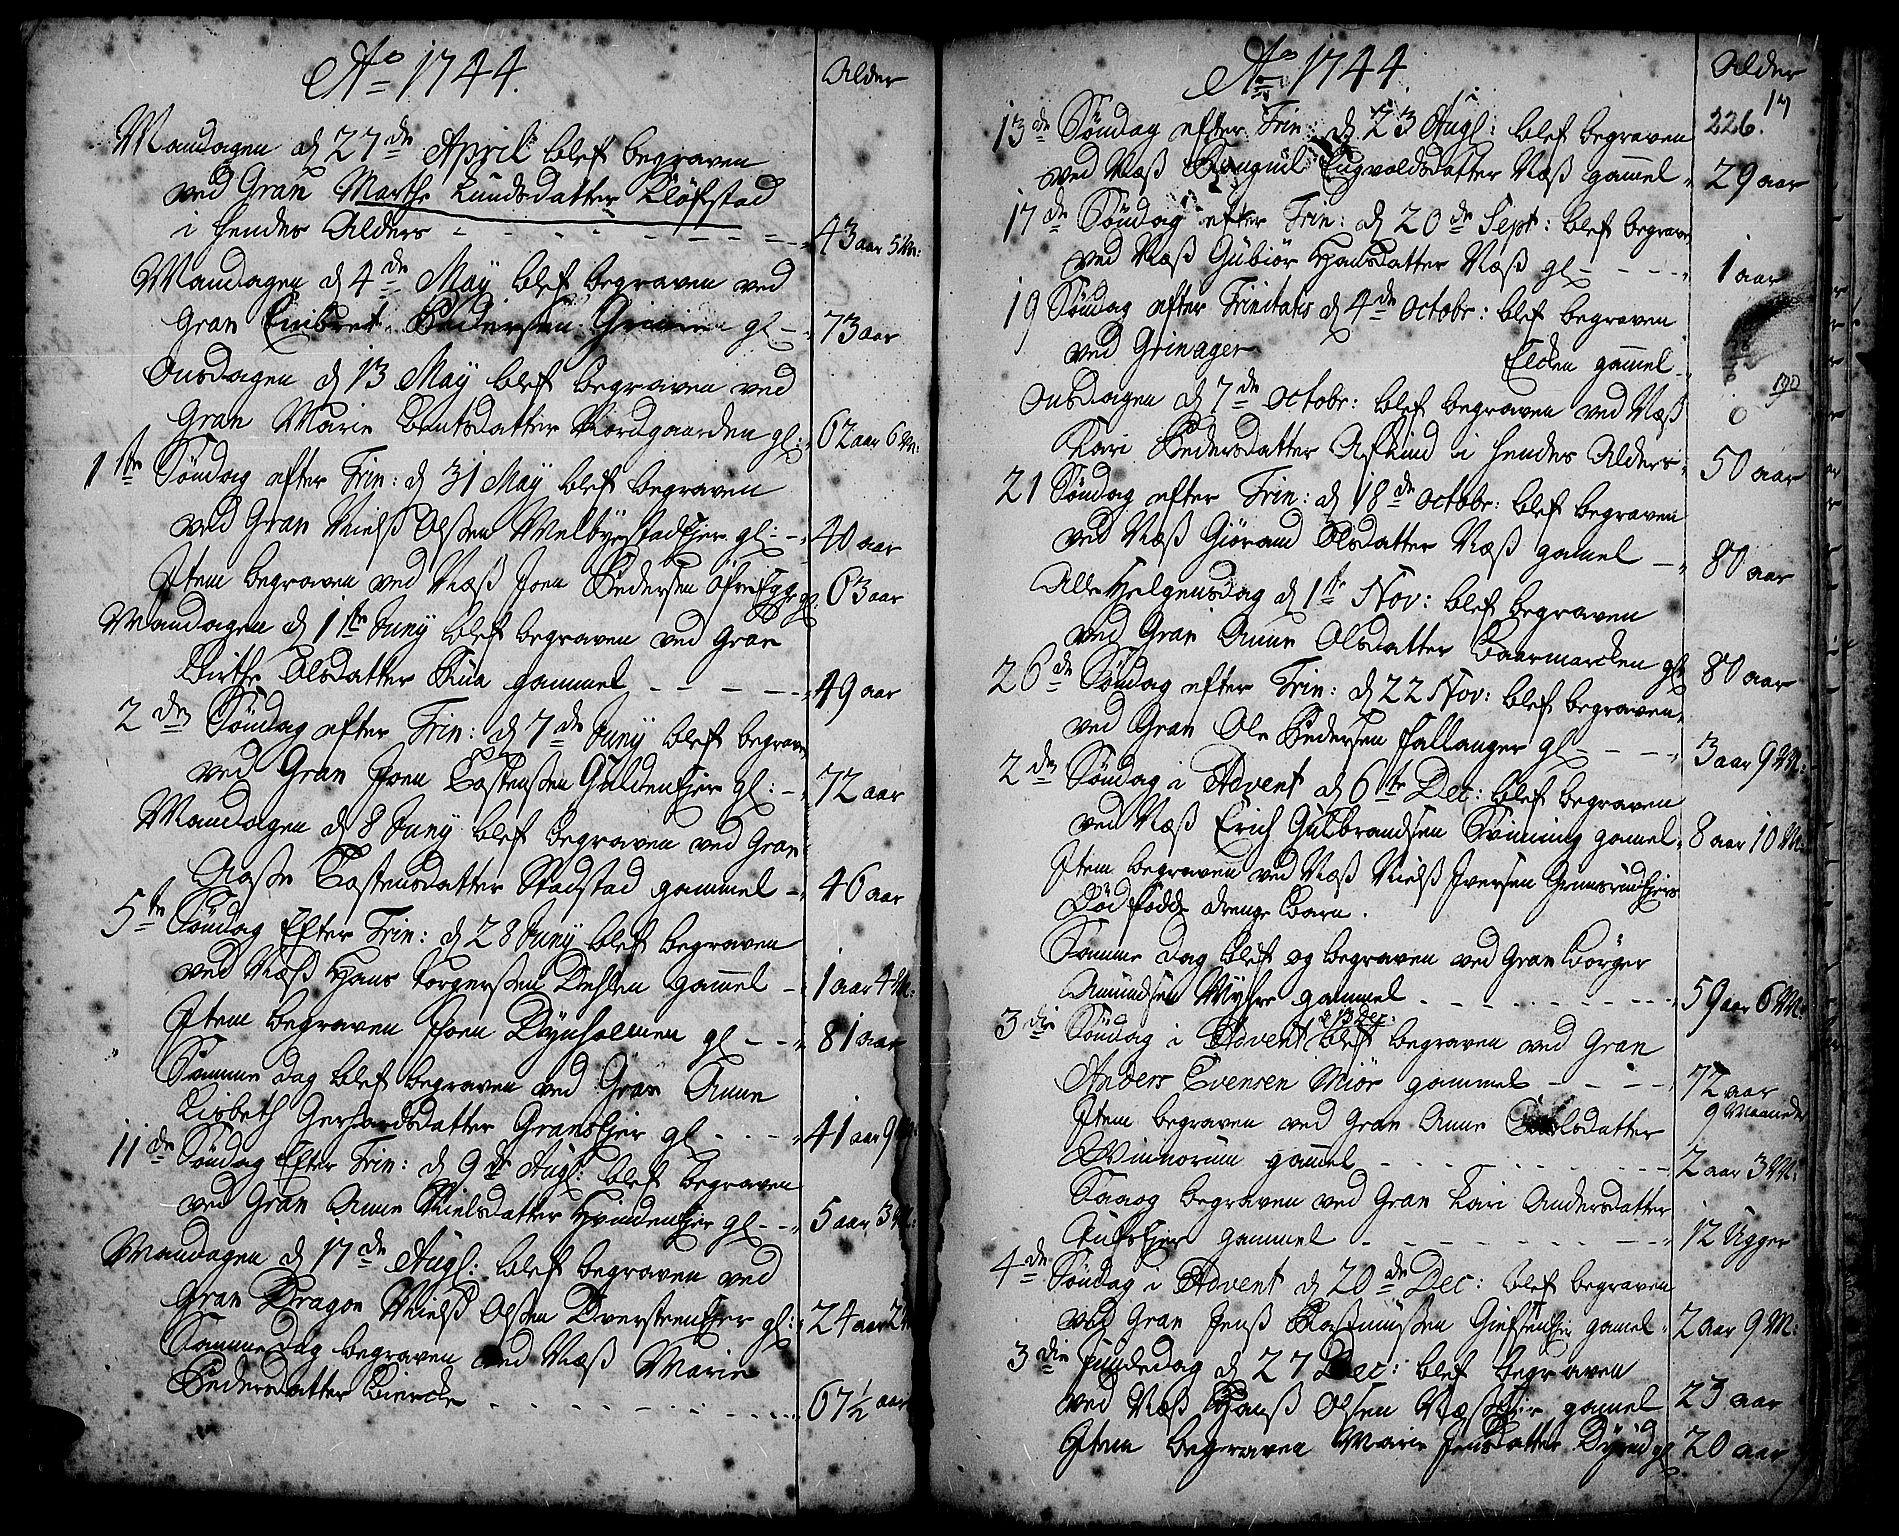 SAH, Gran prestekontor, Ministerialbok nr. 2, 1732-1744, s. 226